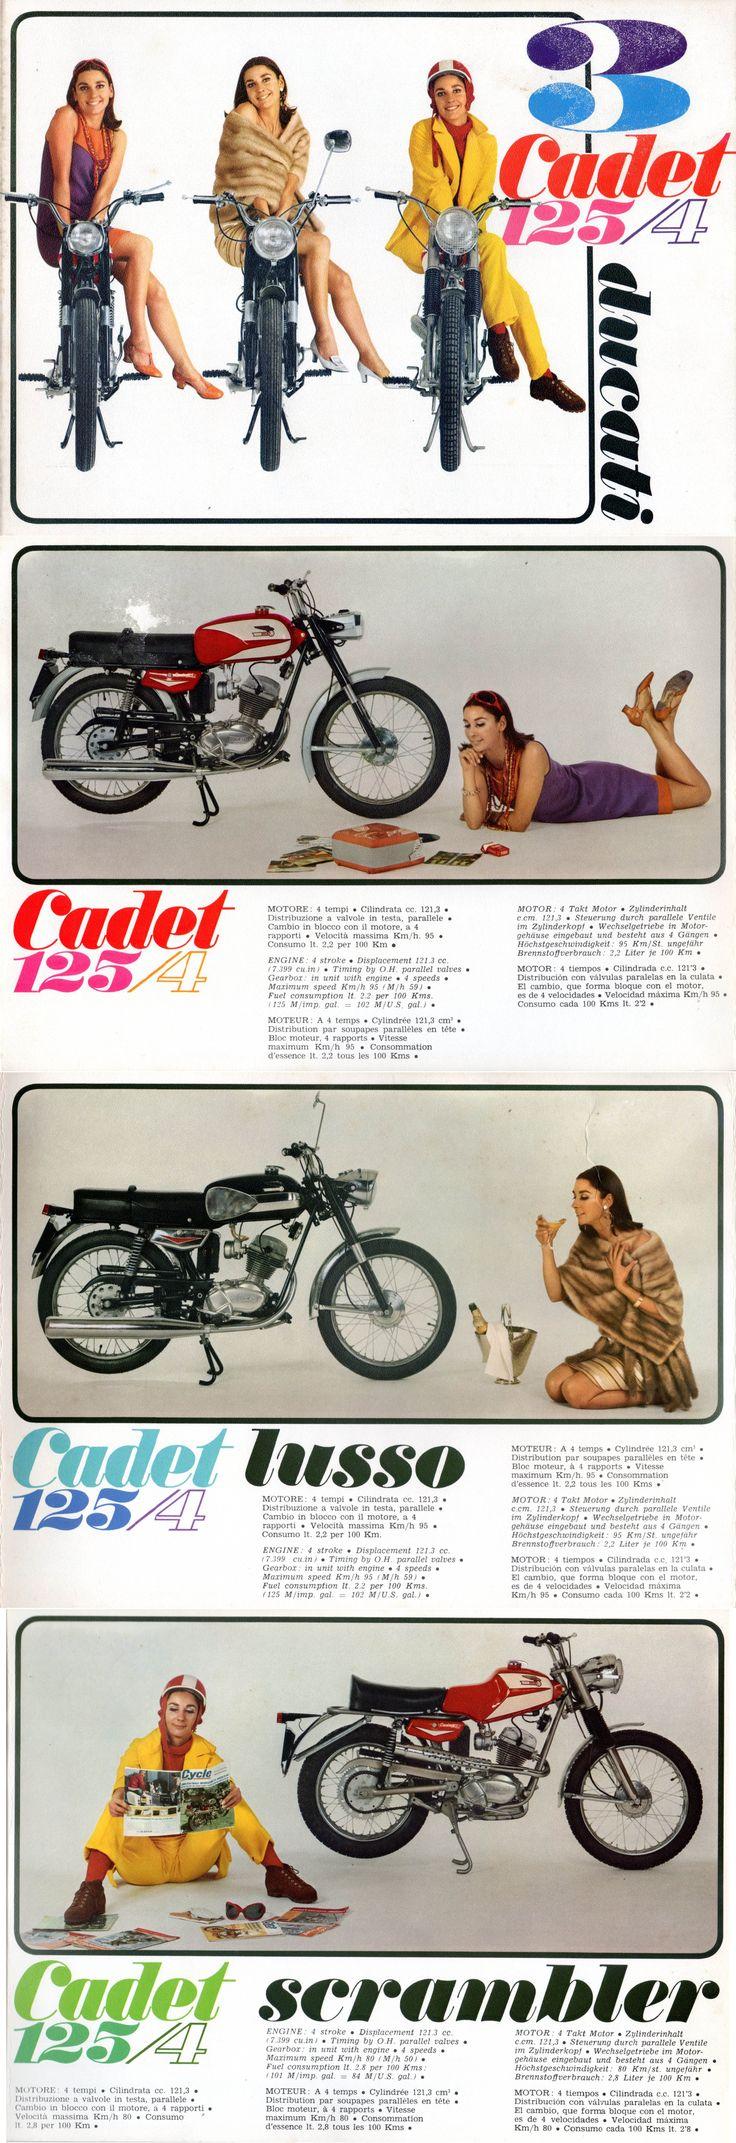 Ducati Cadet 125 x 3